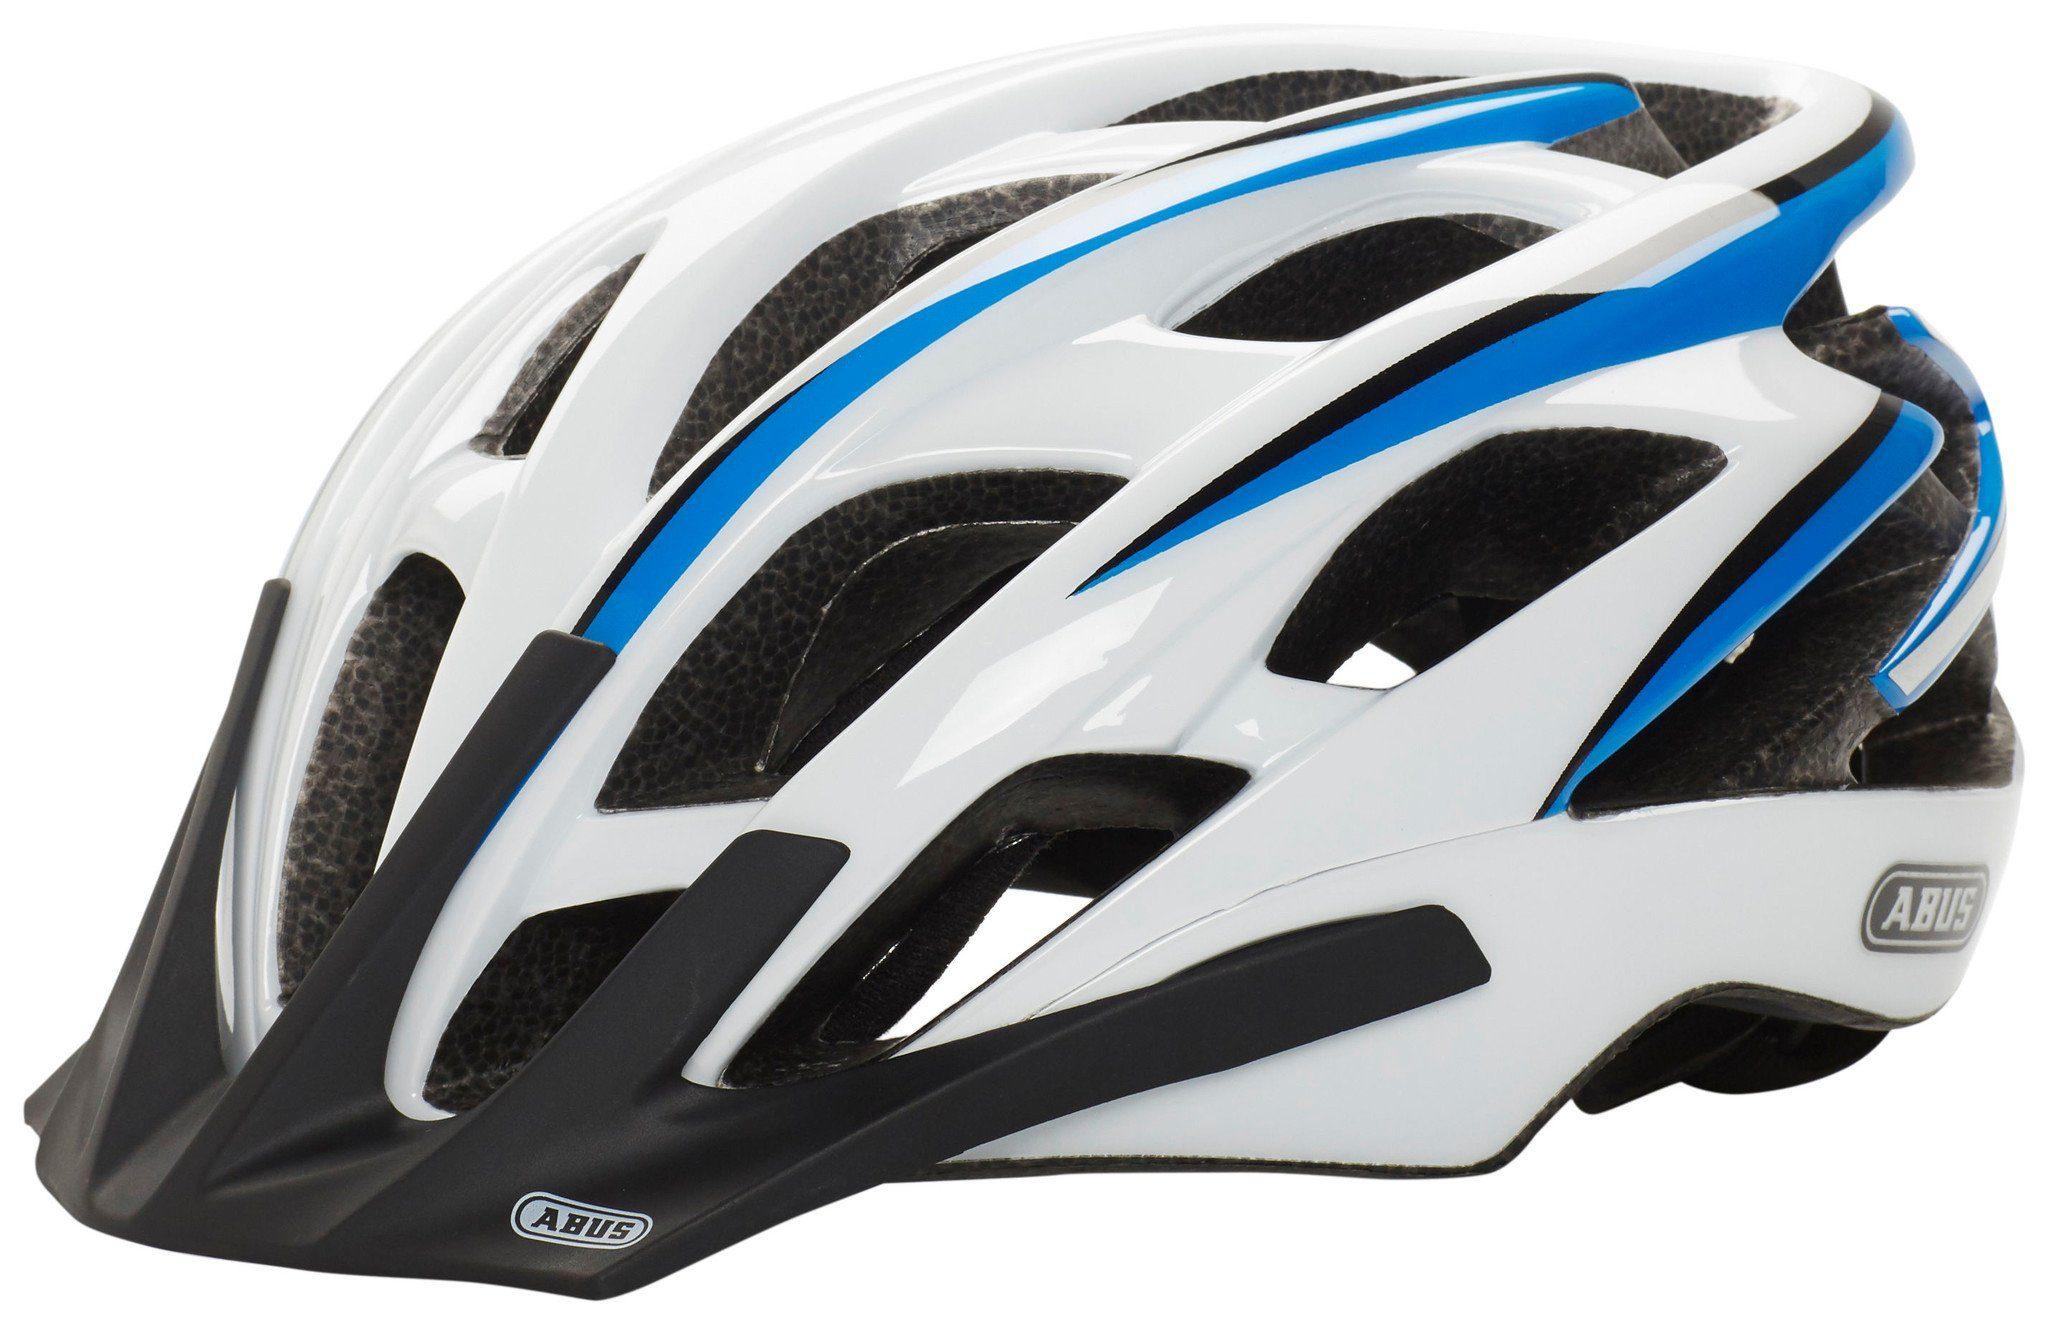 ABUS Fahrradhelm »S-Force Pro Helmet«